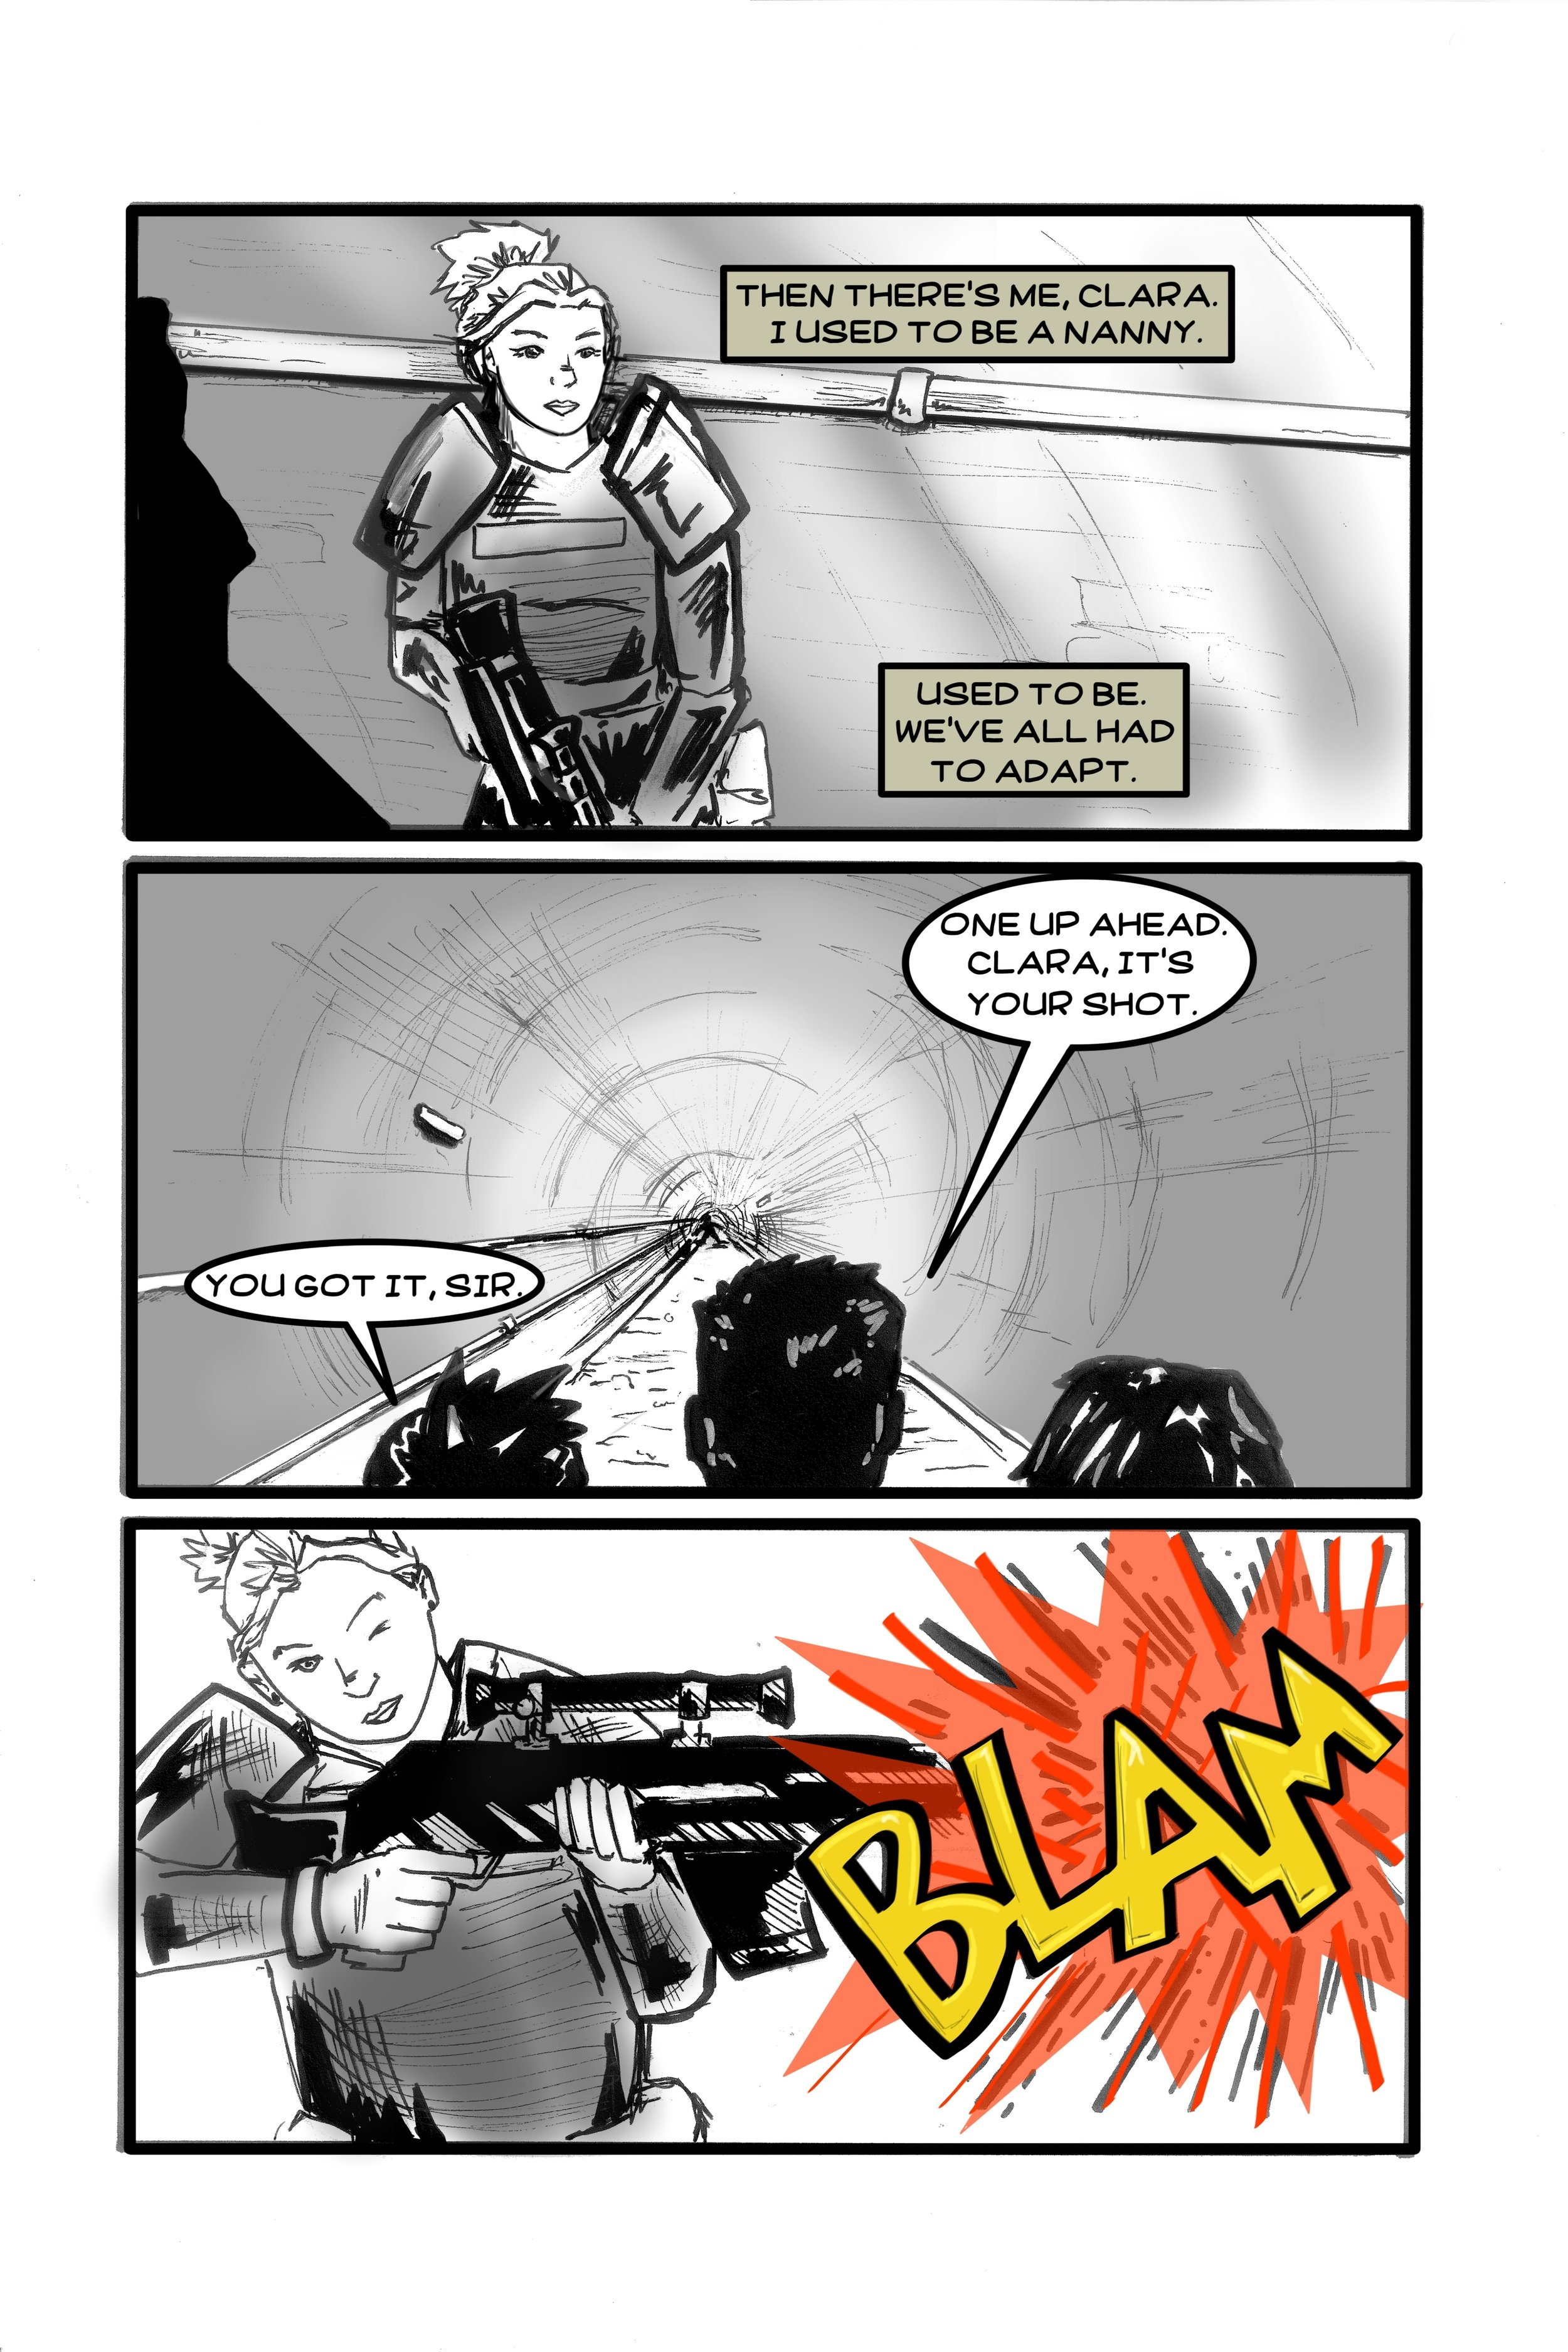 twh page6.jpg